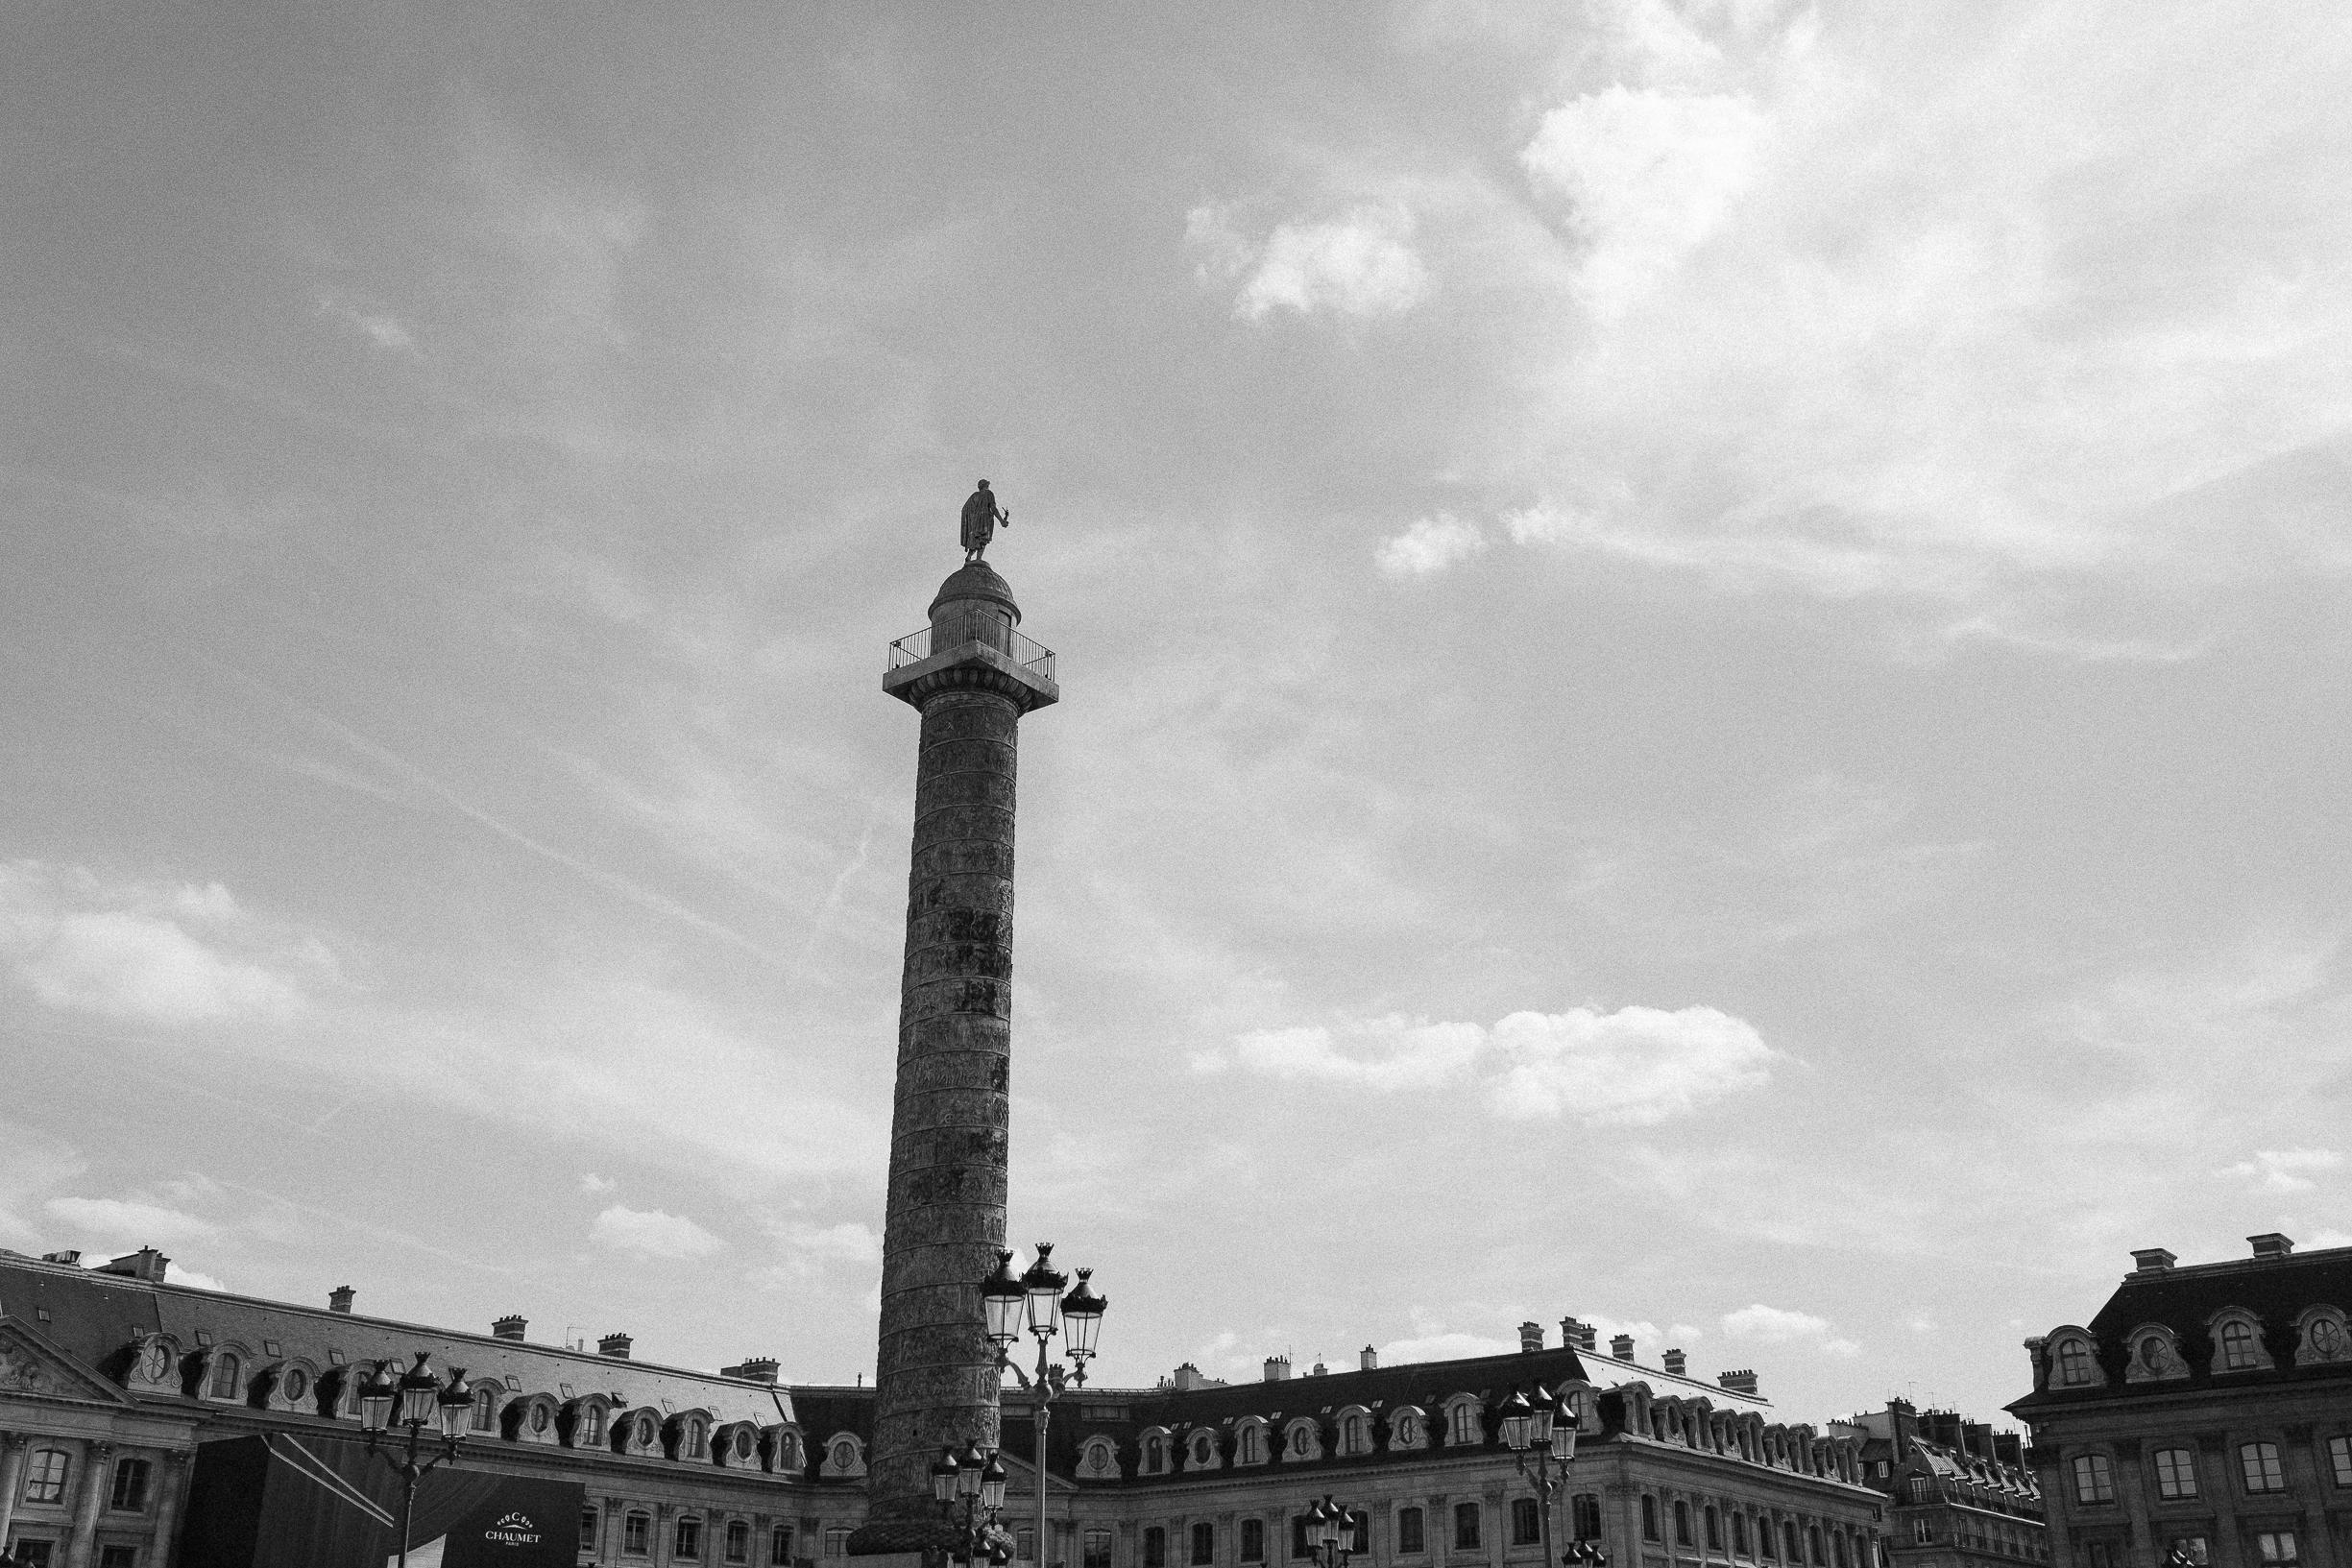 Place Vendome Tower